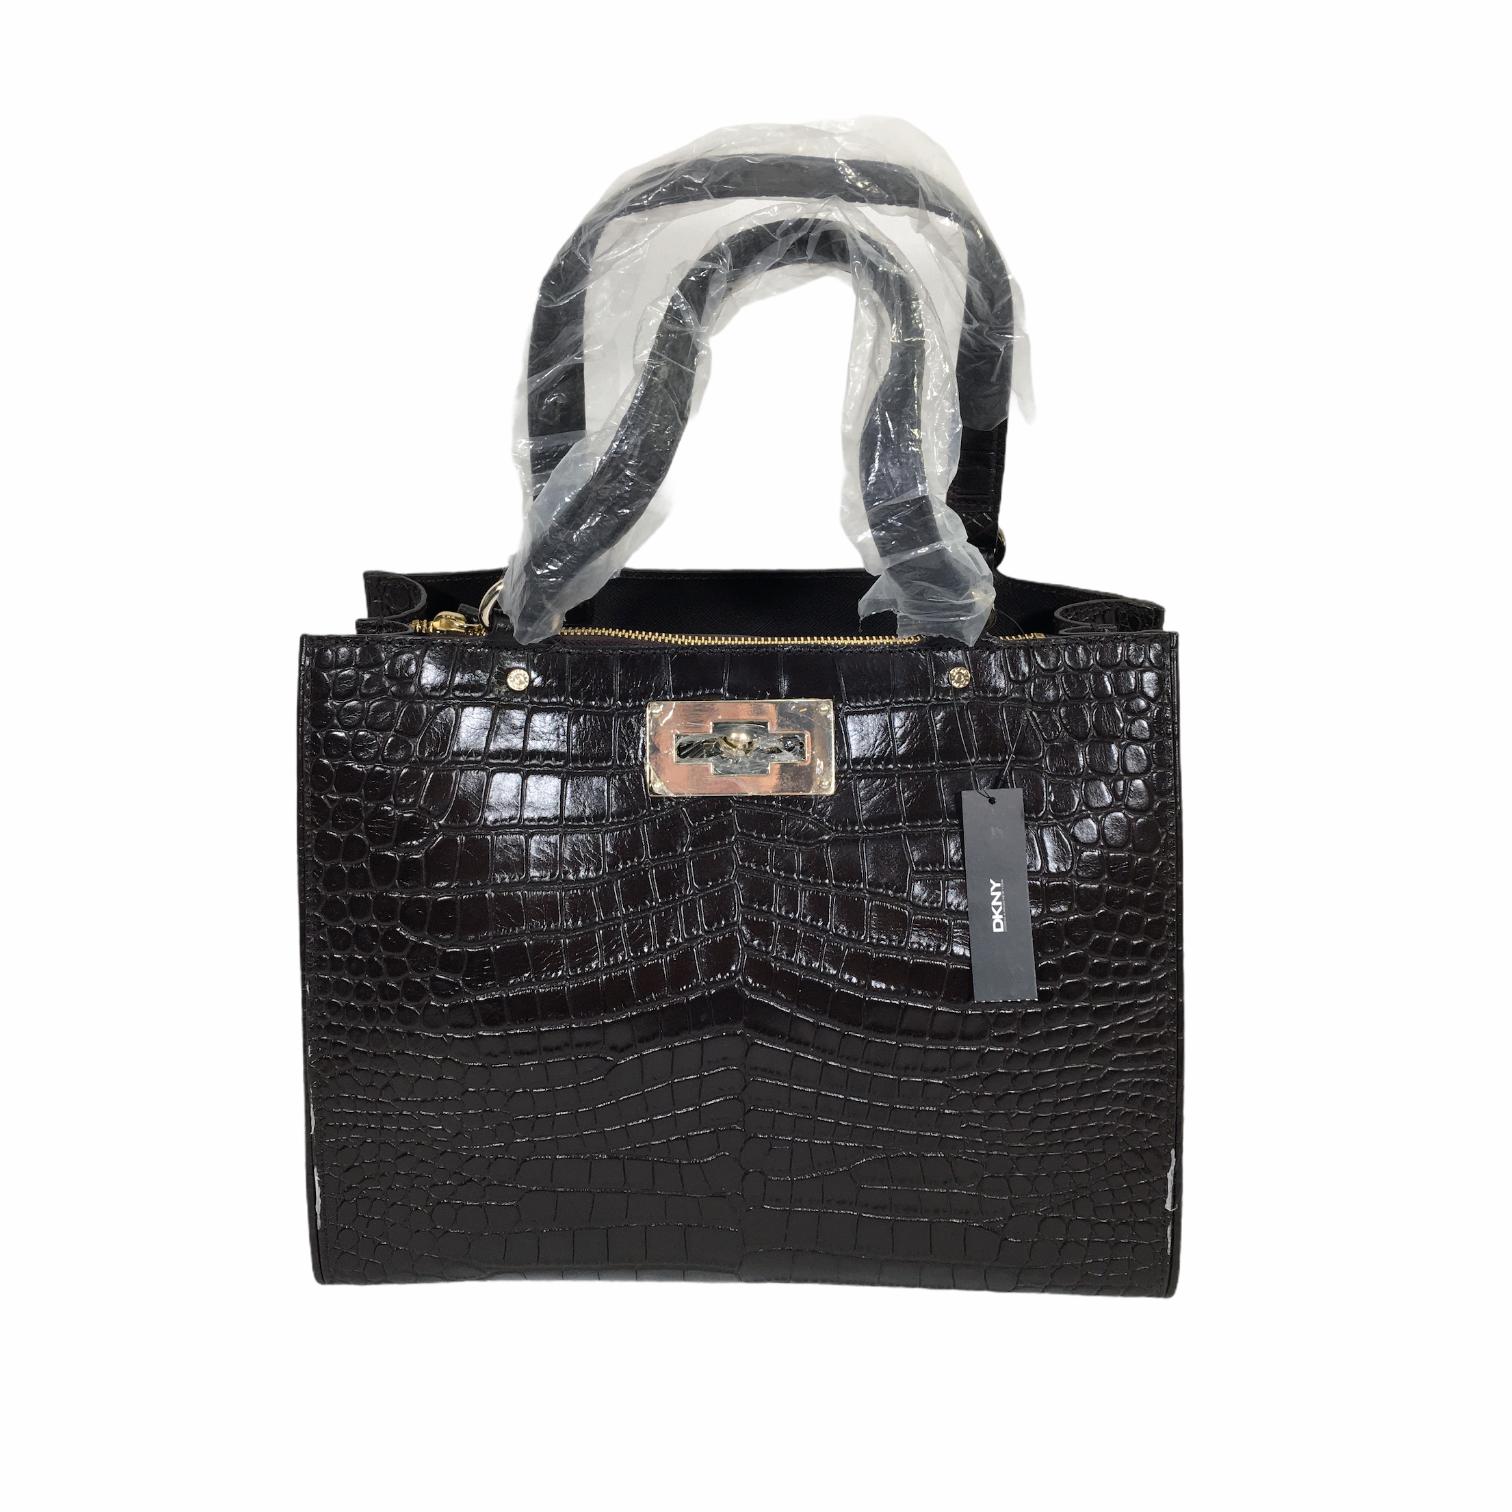 DKNY Croco Leather Purse, Dark Bro, Size: Purses